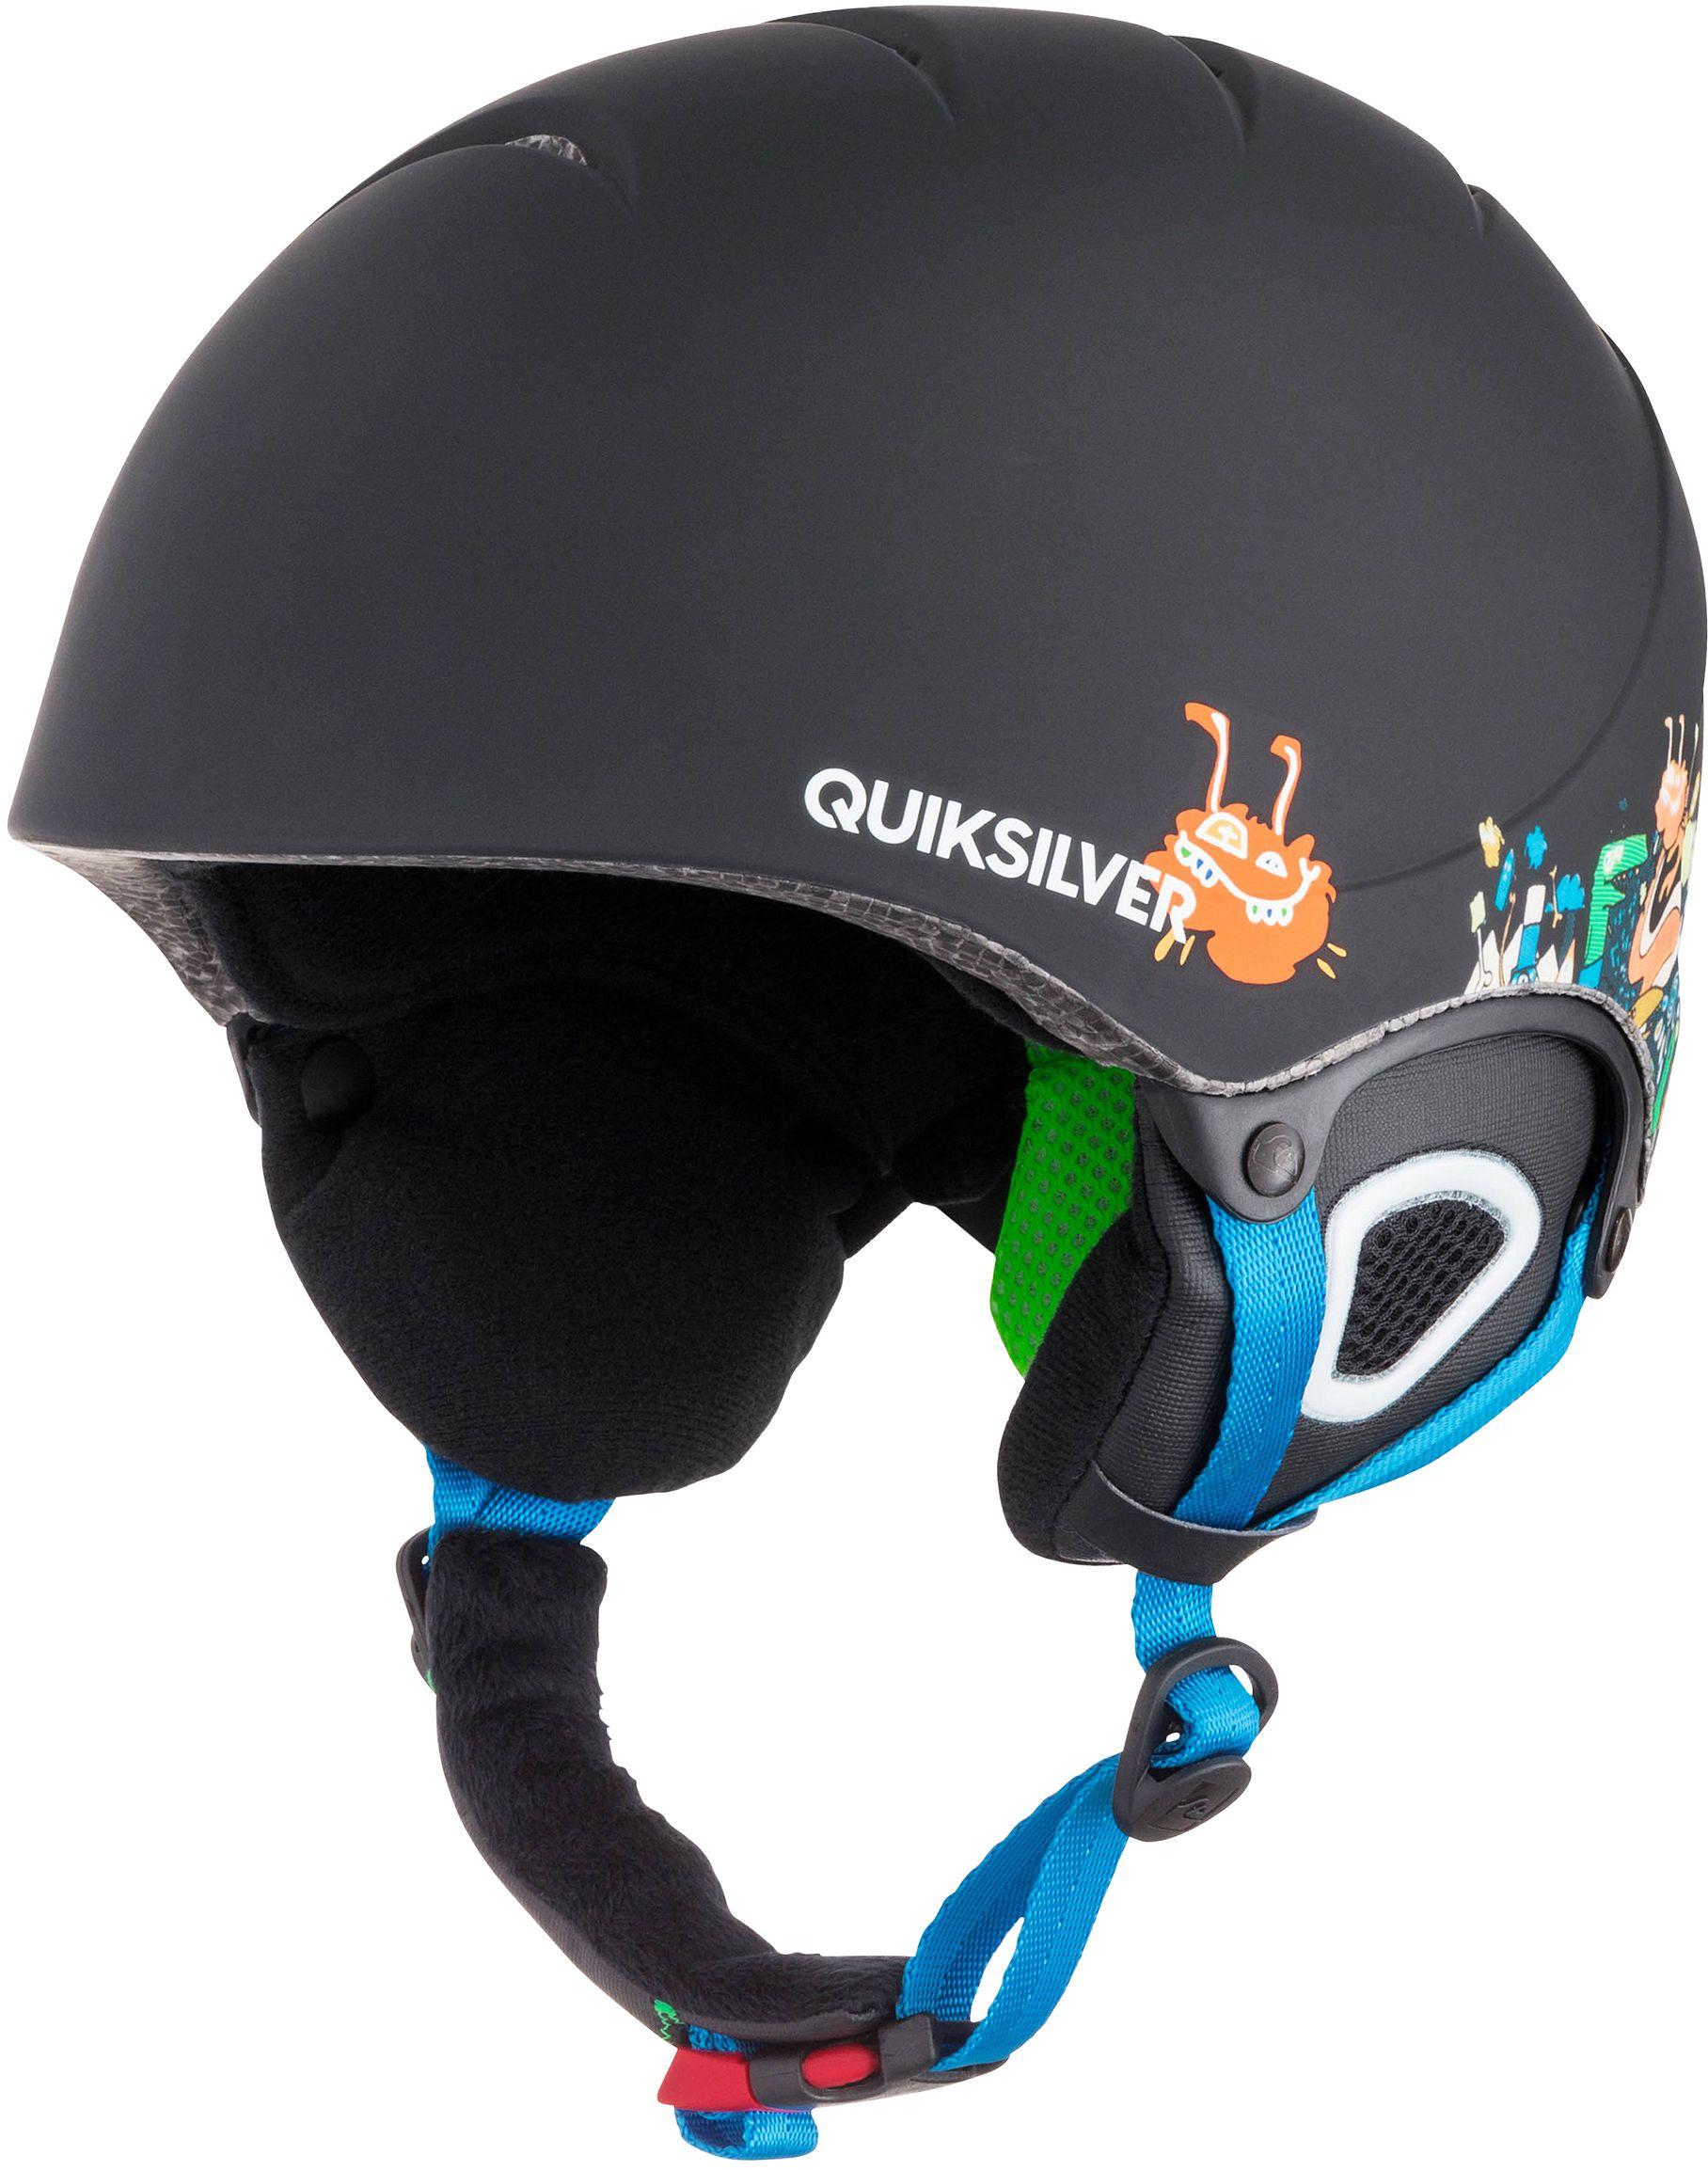 dětská helma QUIKSILVER THE GAME B HLMT KVJ0